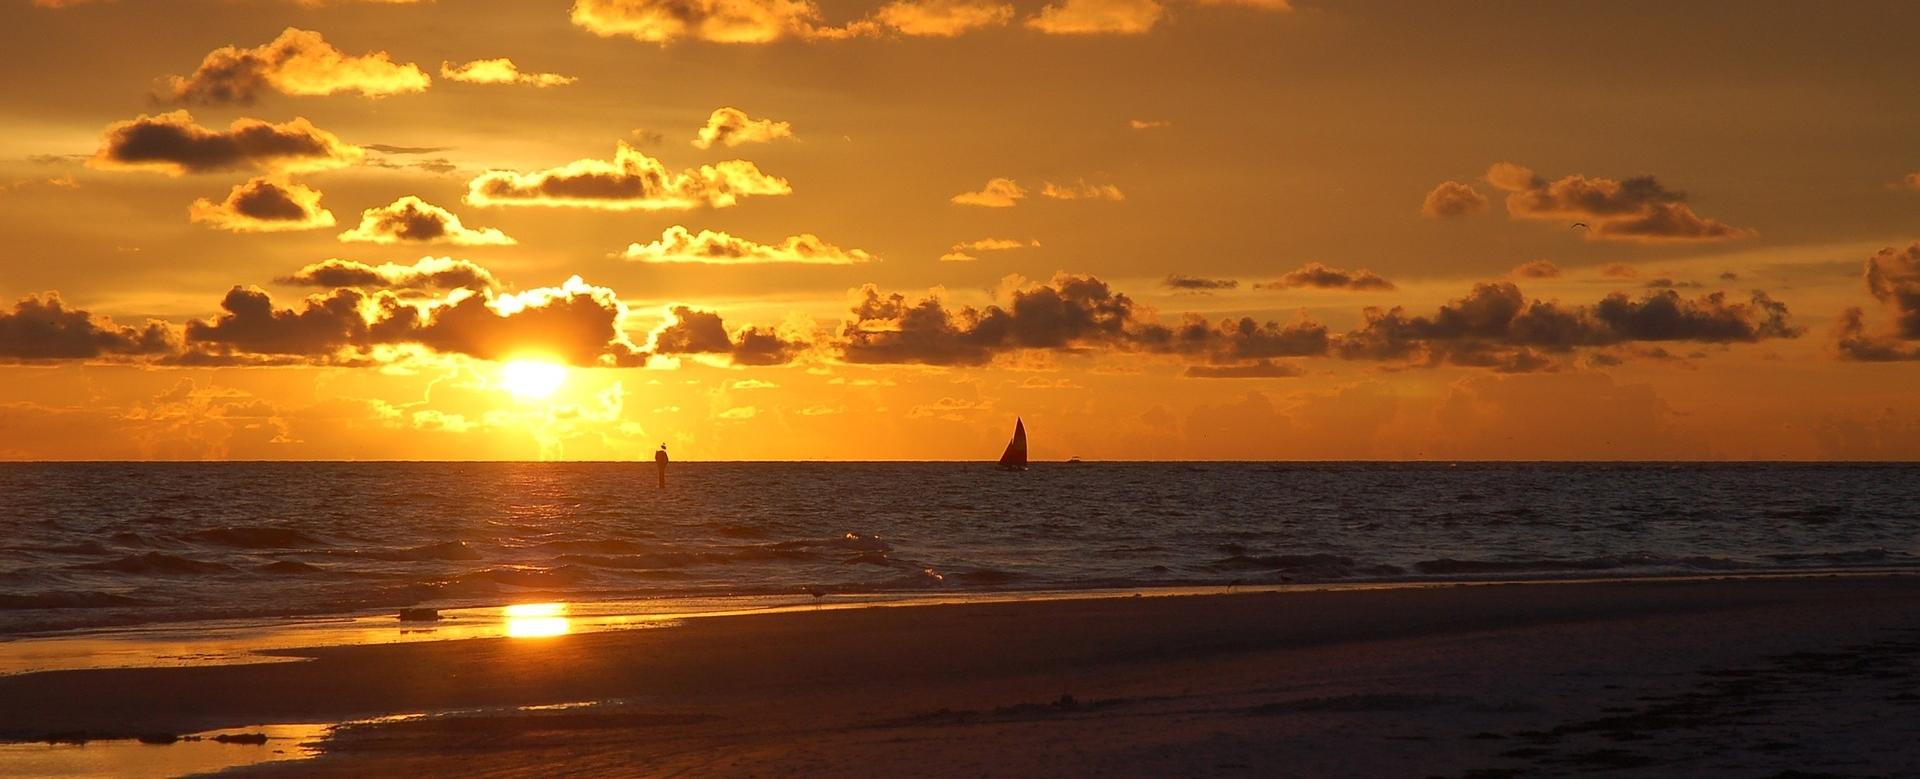 sunset-1032604_1920.jpg